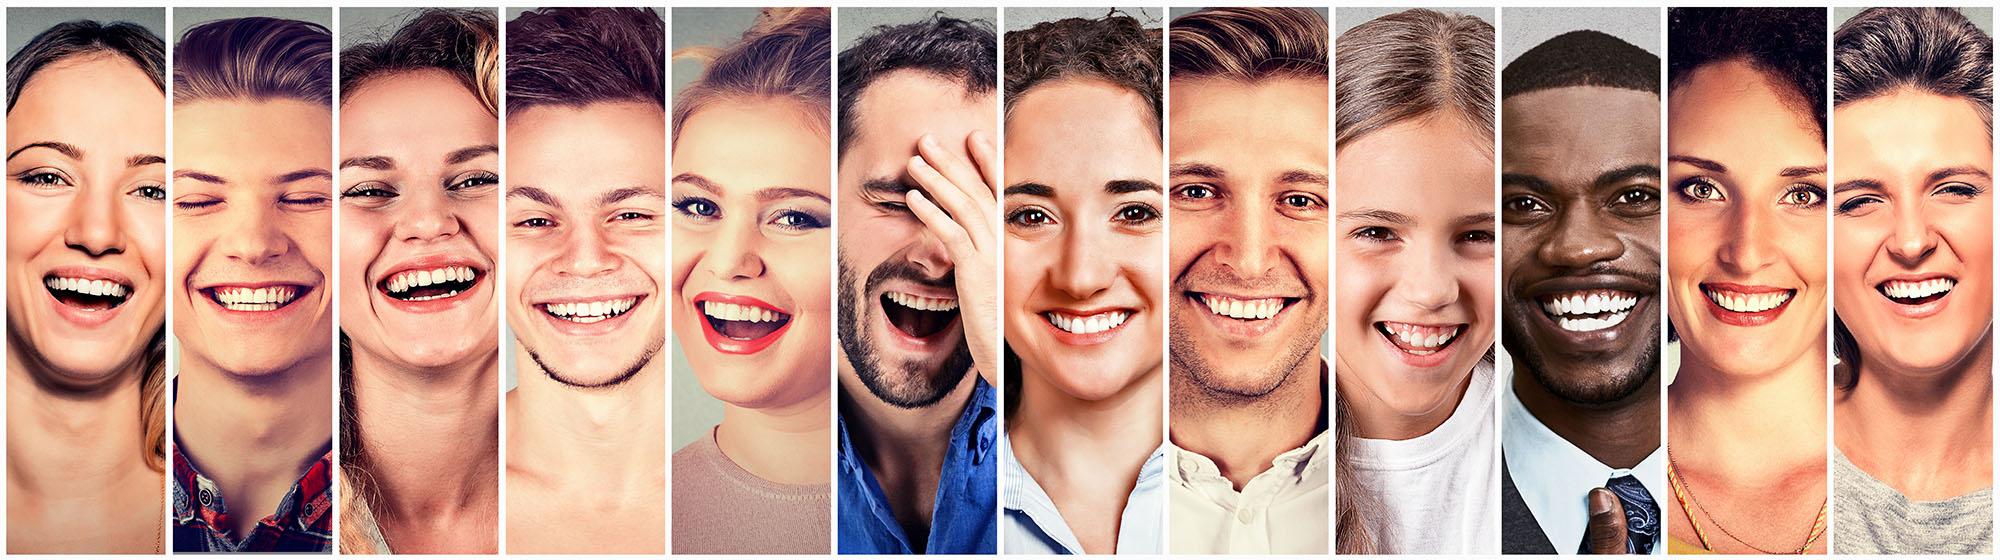 Laughing people. Group happy men, women, children